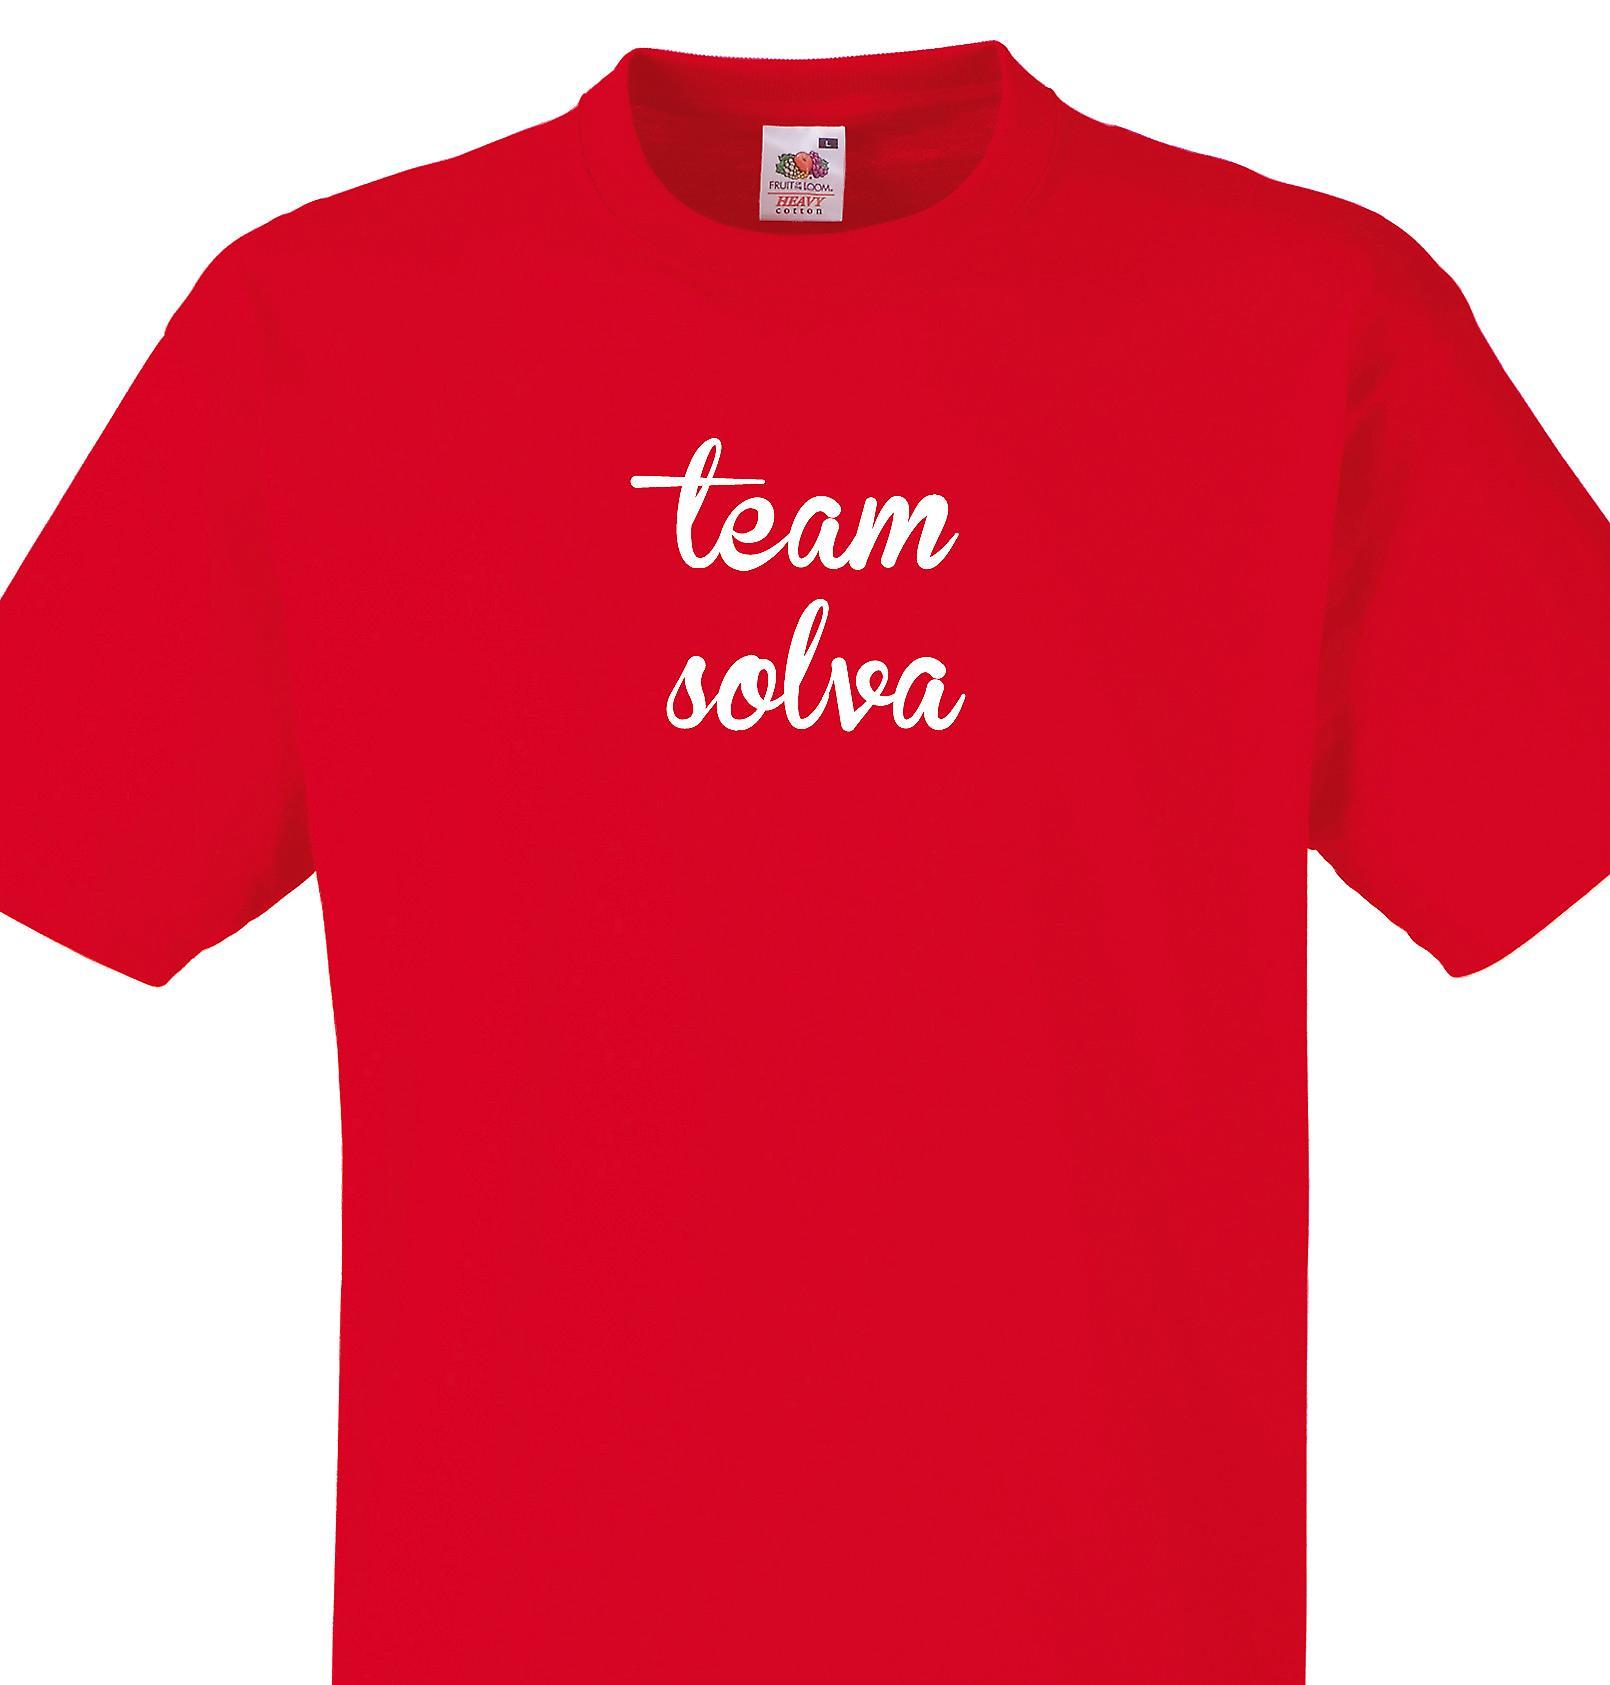 Team Solva Red T shirt